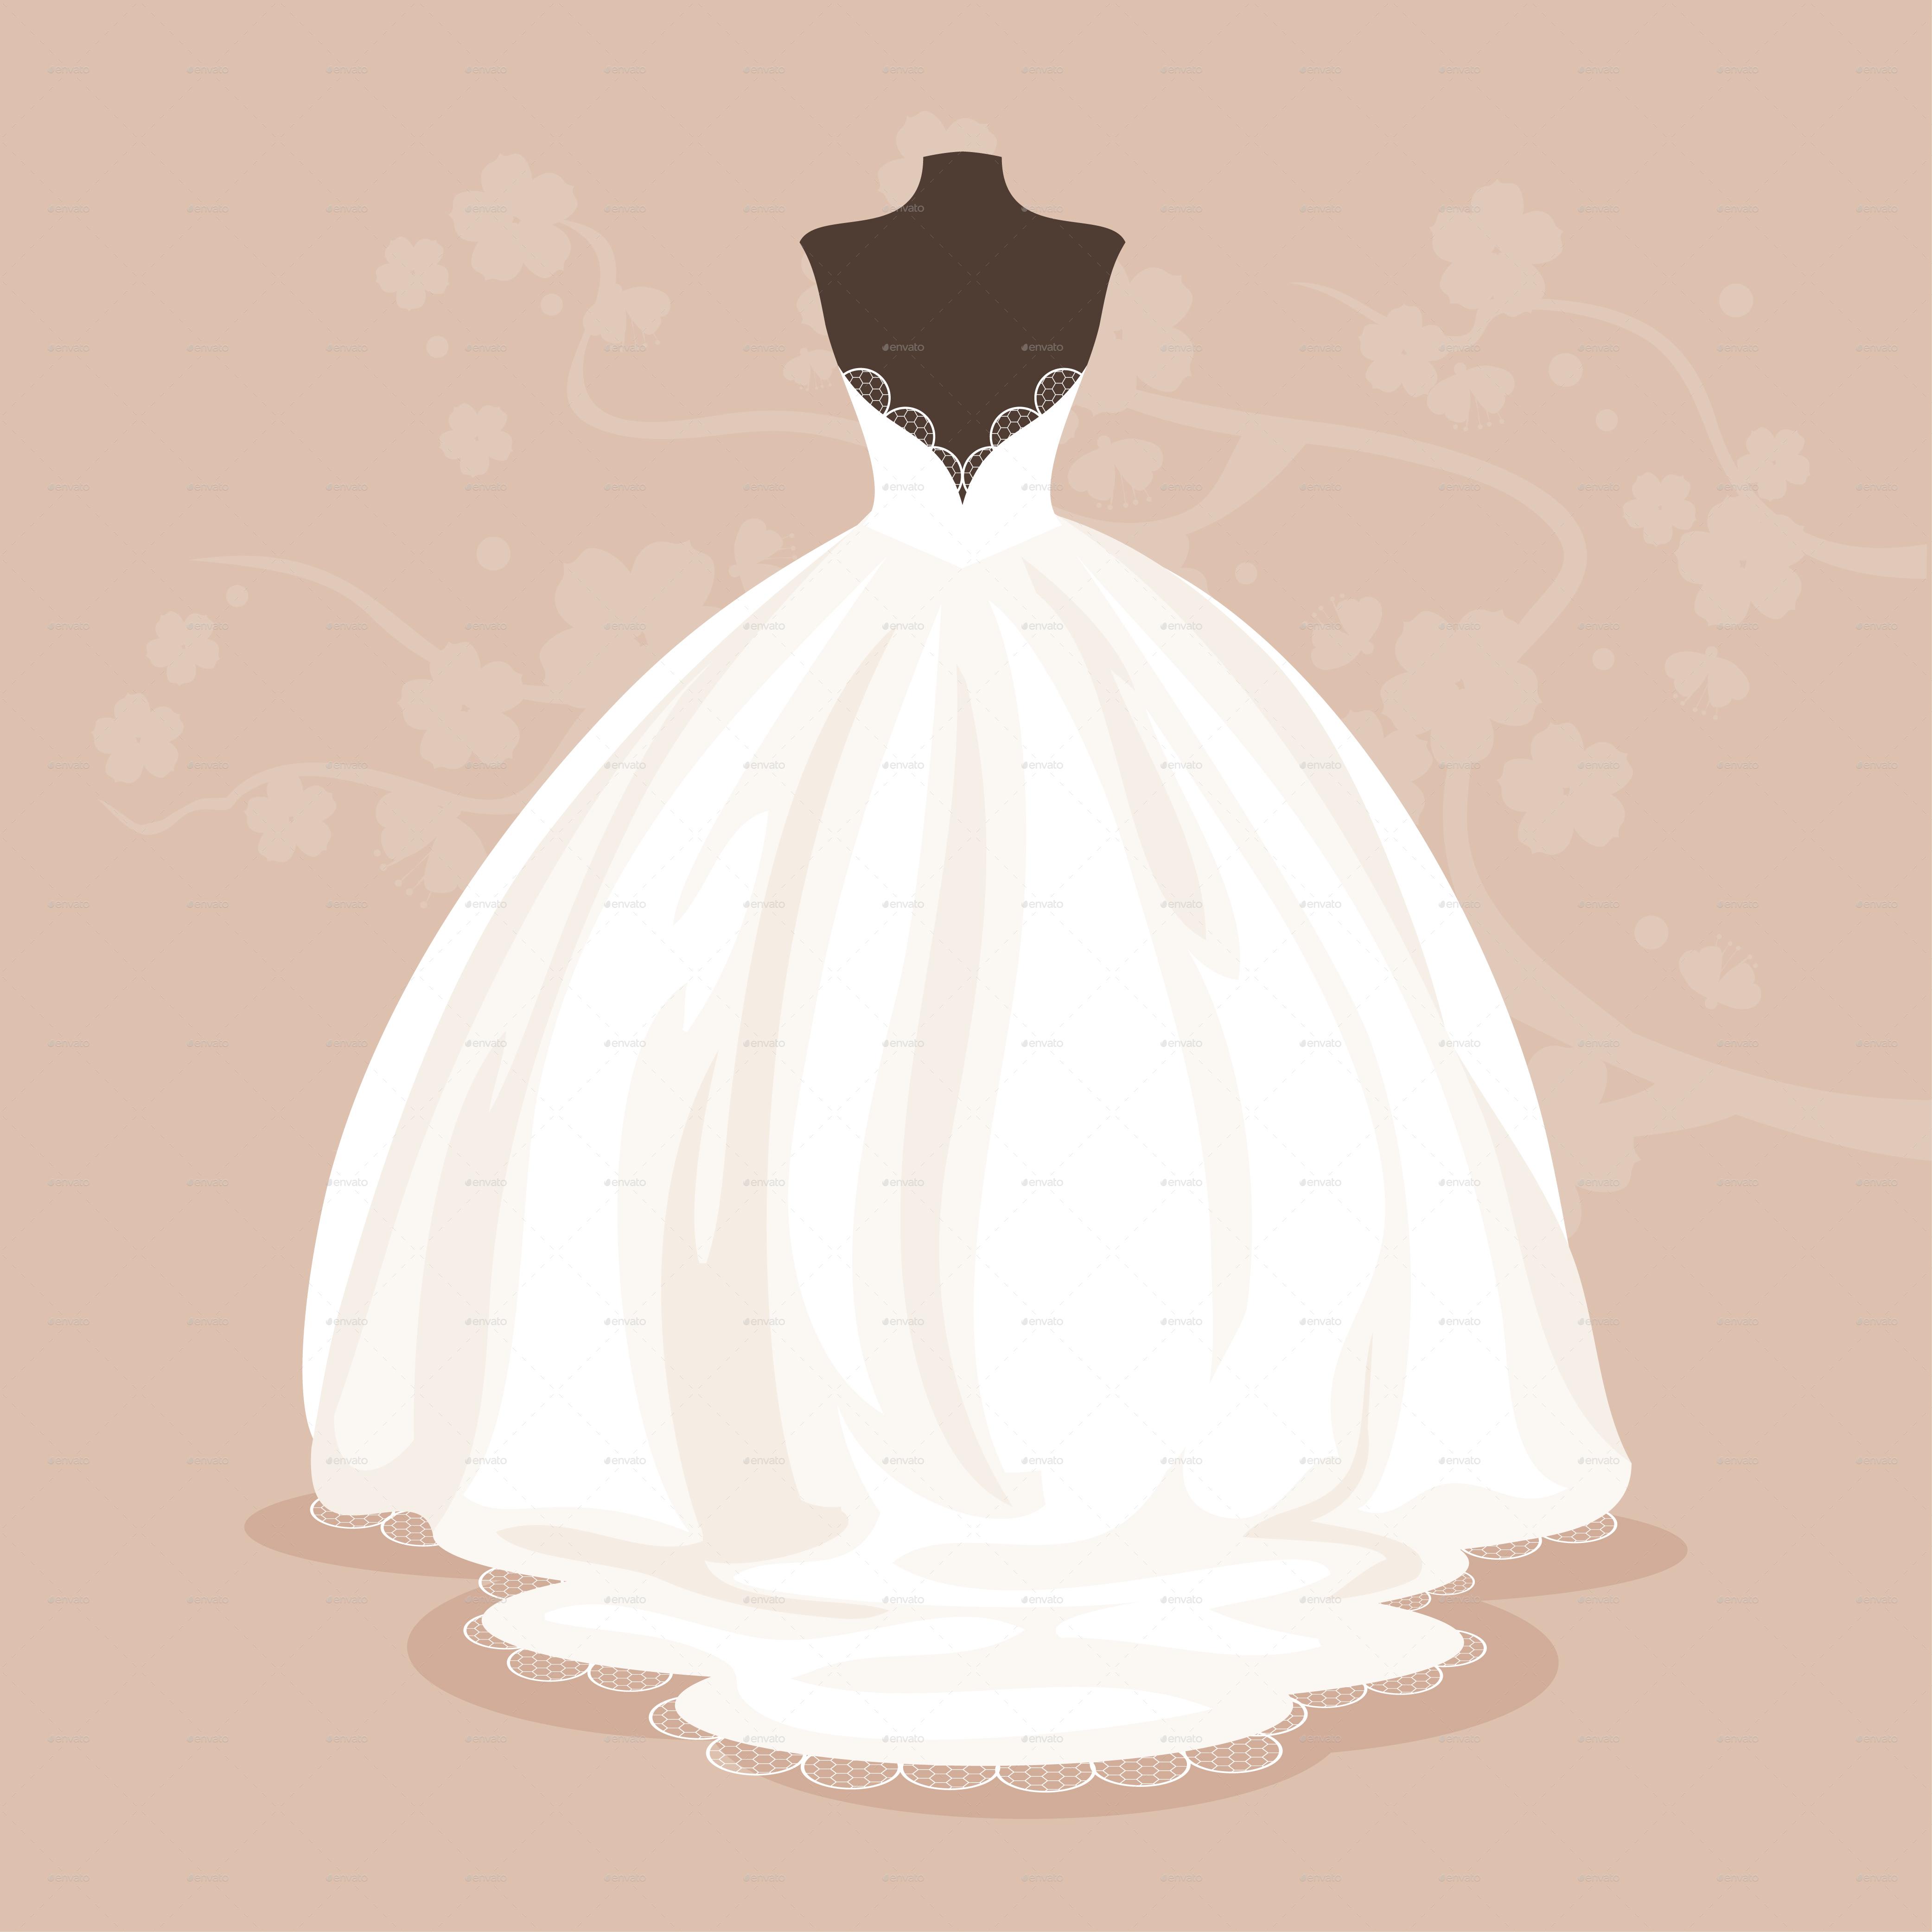 4167x4167 Wedding Dress By Artbesouro Graphicriver